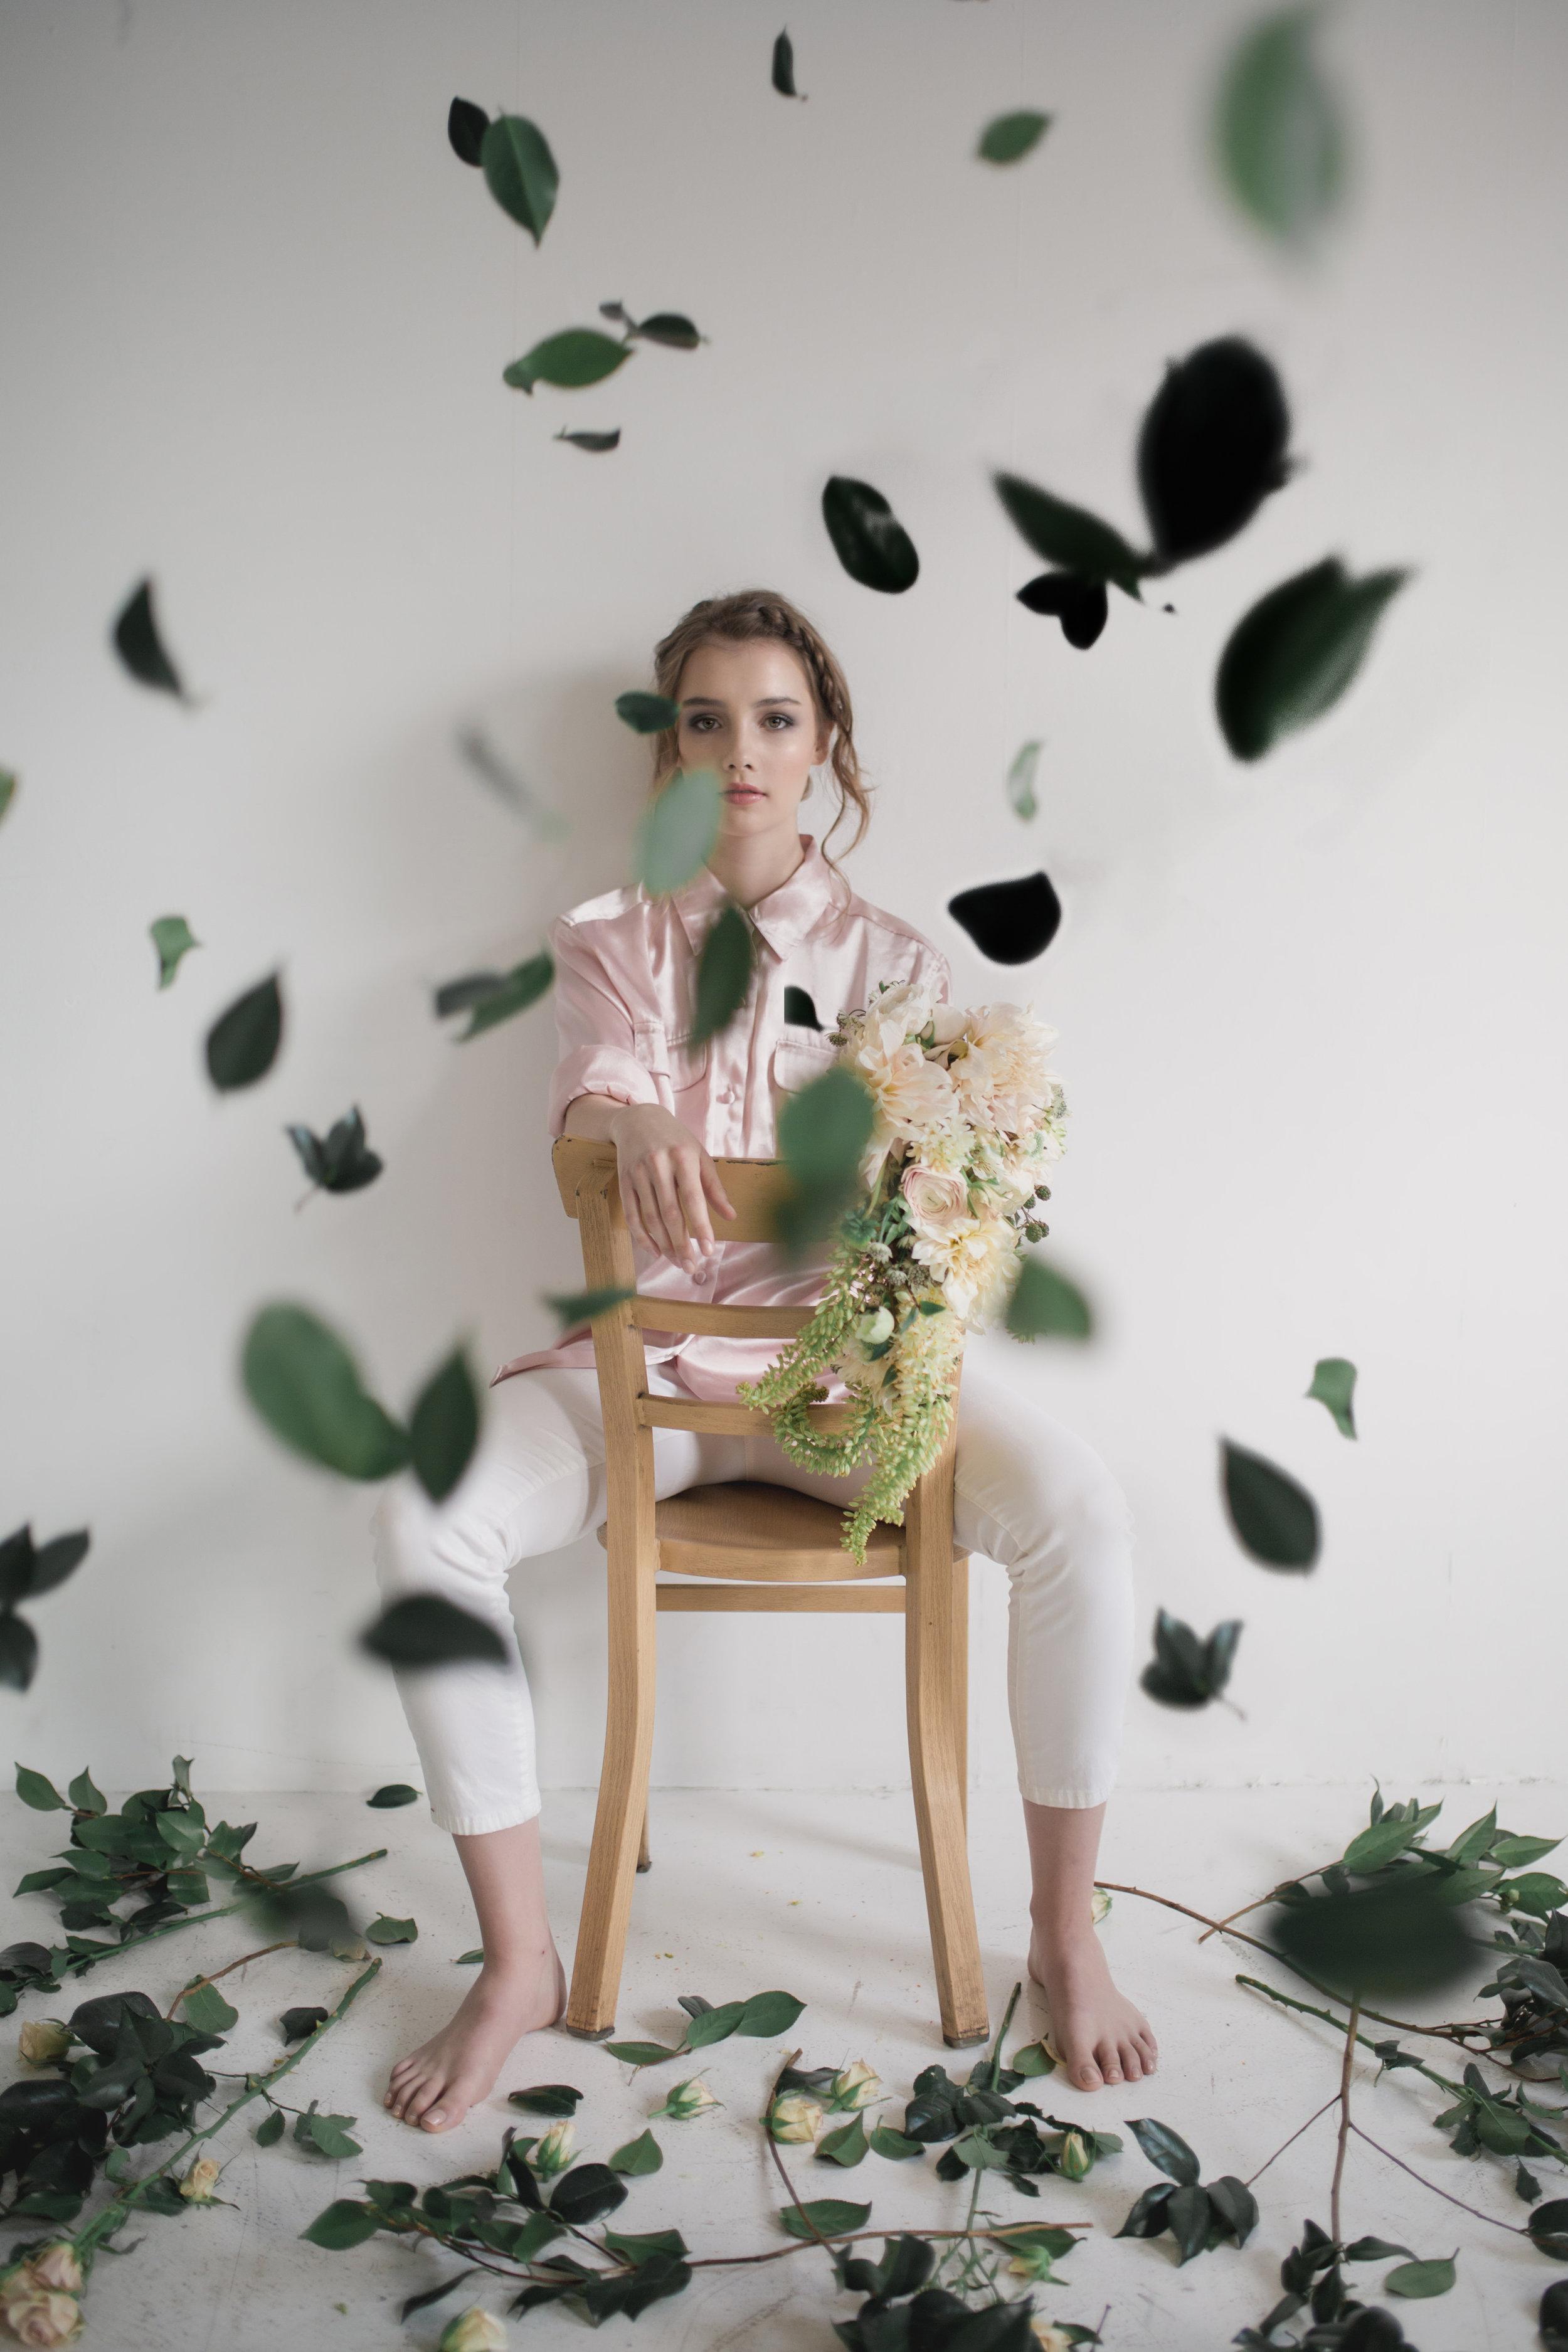 Dillion Ivory Photography